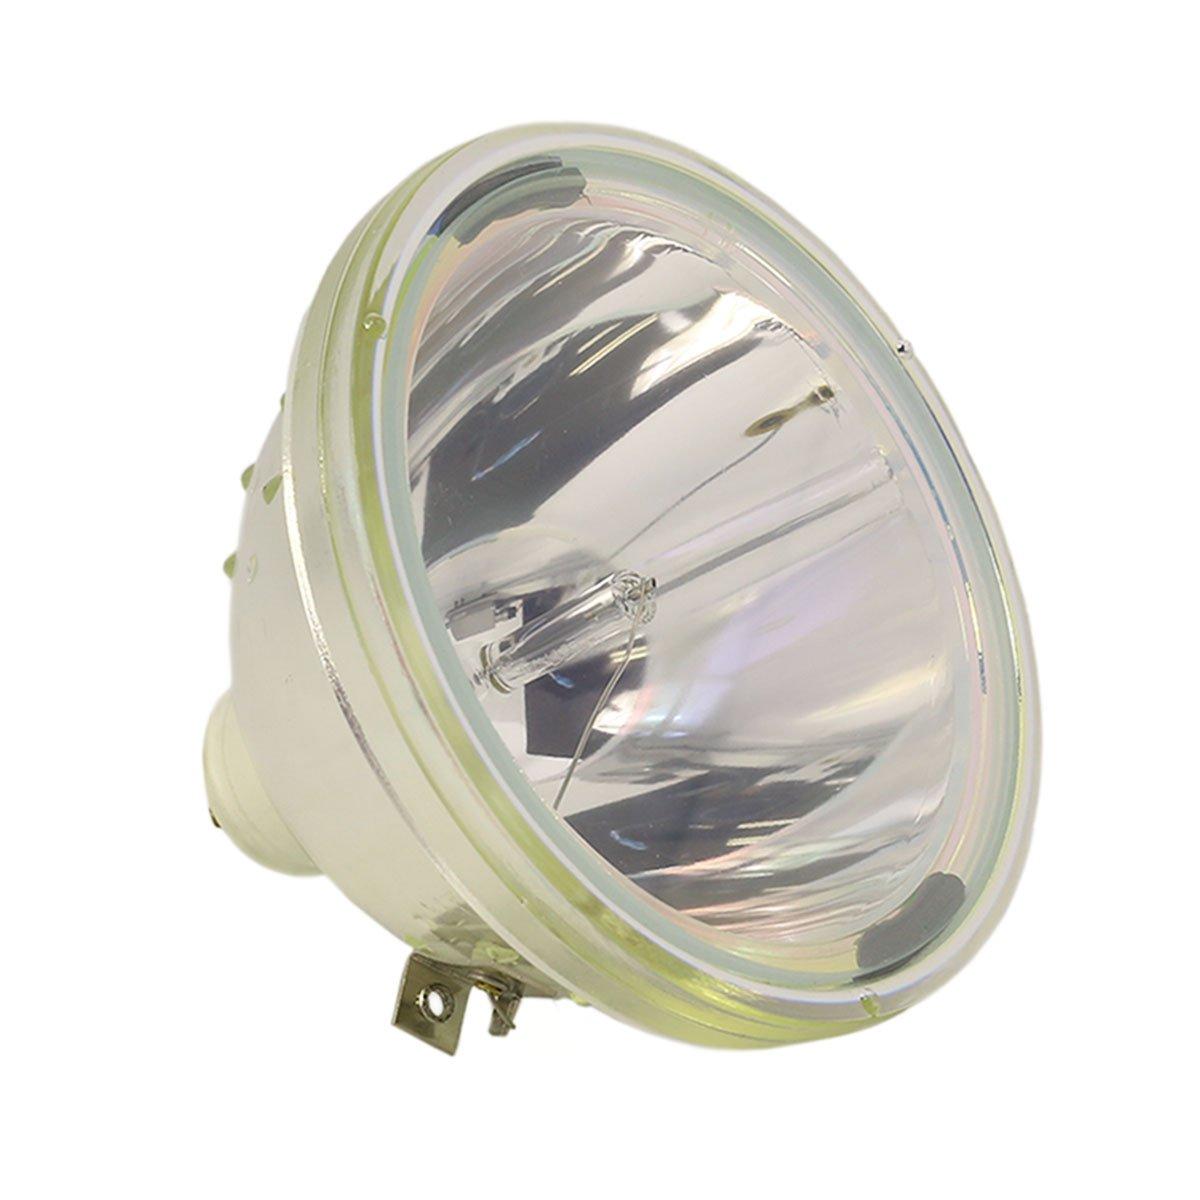 Original OEM Bulb Inside Lytio Premium for Geha 60 252367 Projector Lamp with Housing 60-252367